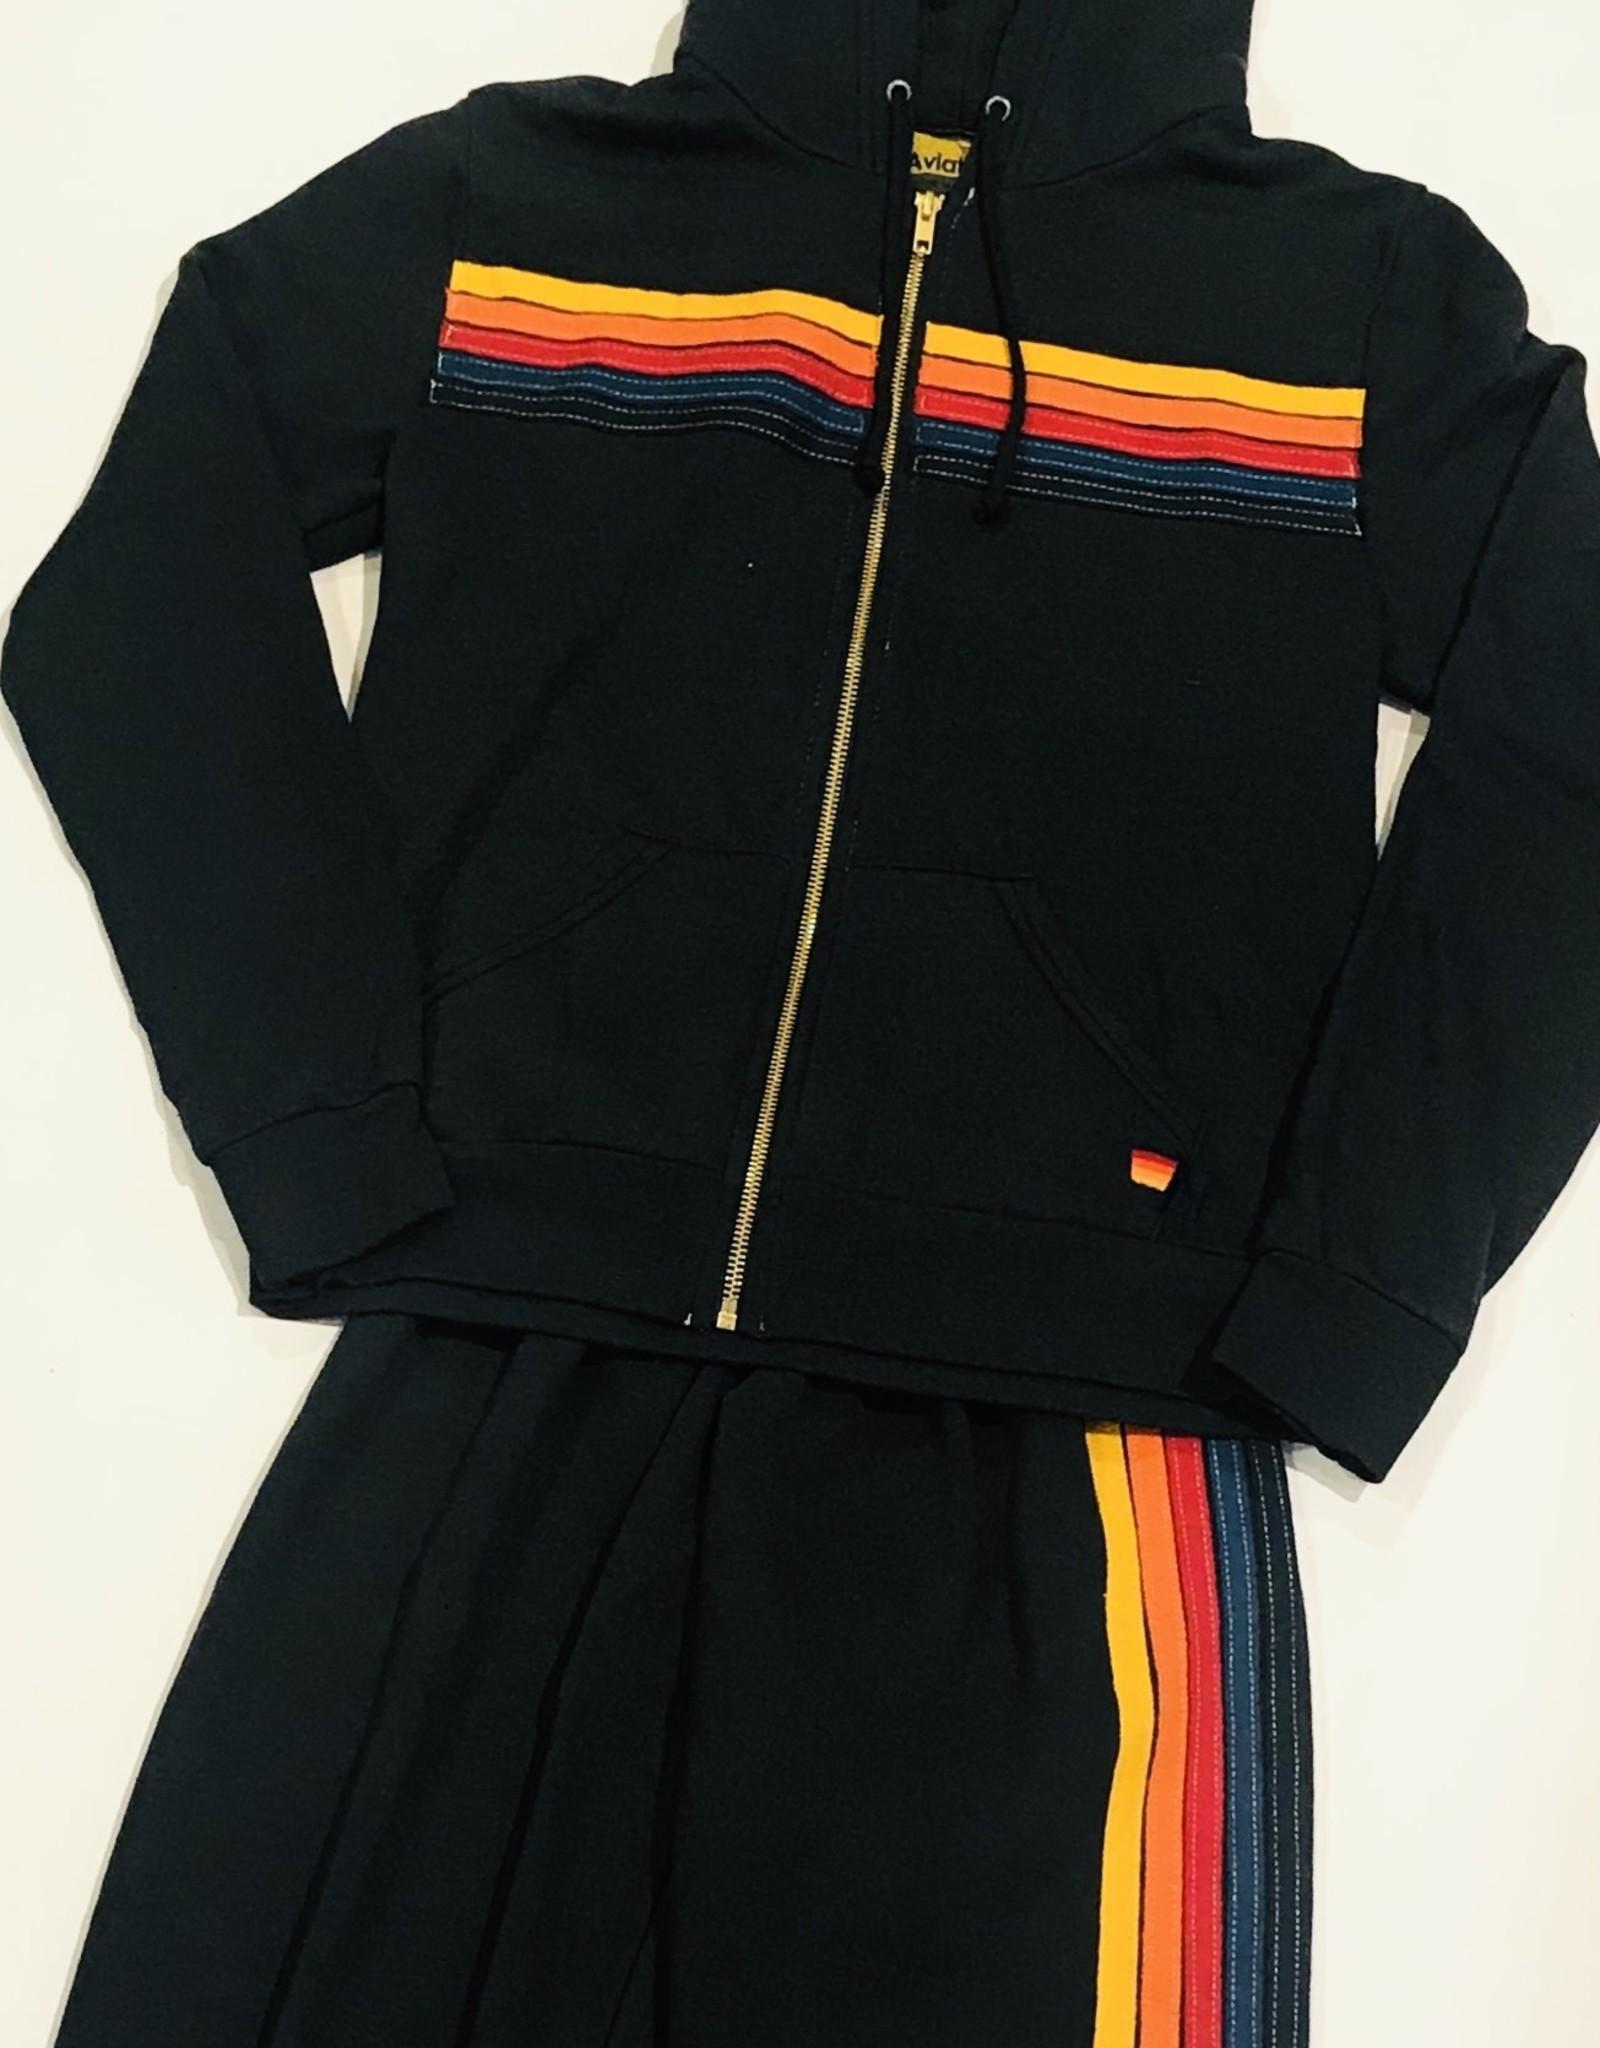 Aviator 5 stripe Womens sweats WSPRS5